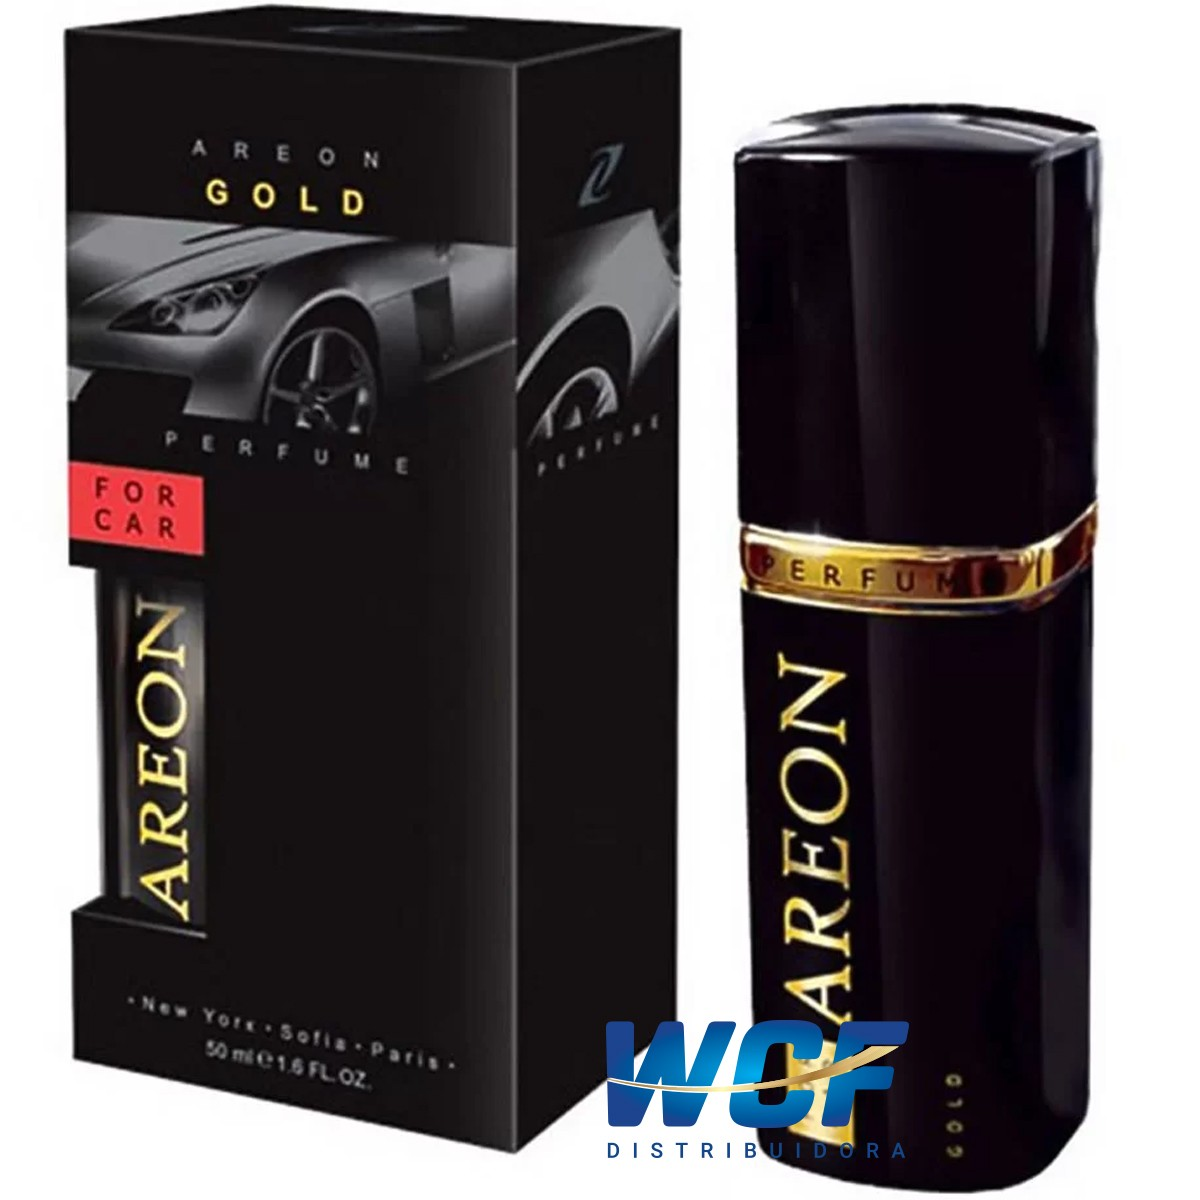 AREON PERFUME GOLD 50 ML